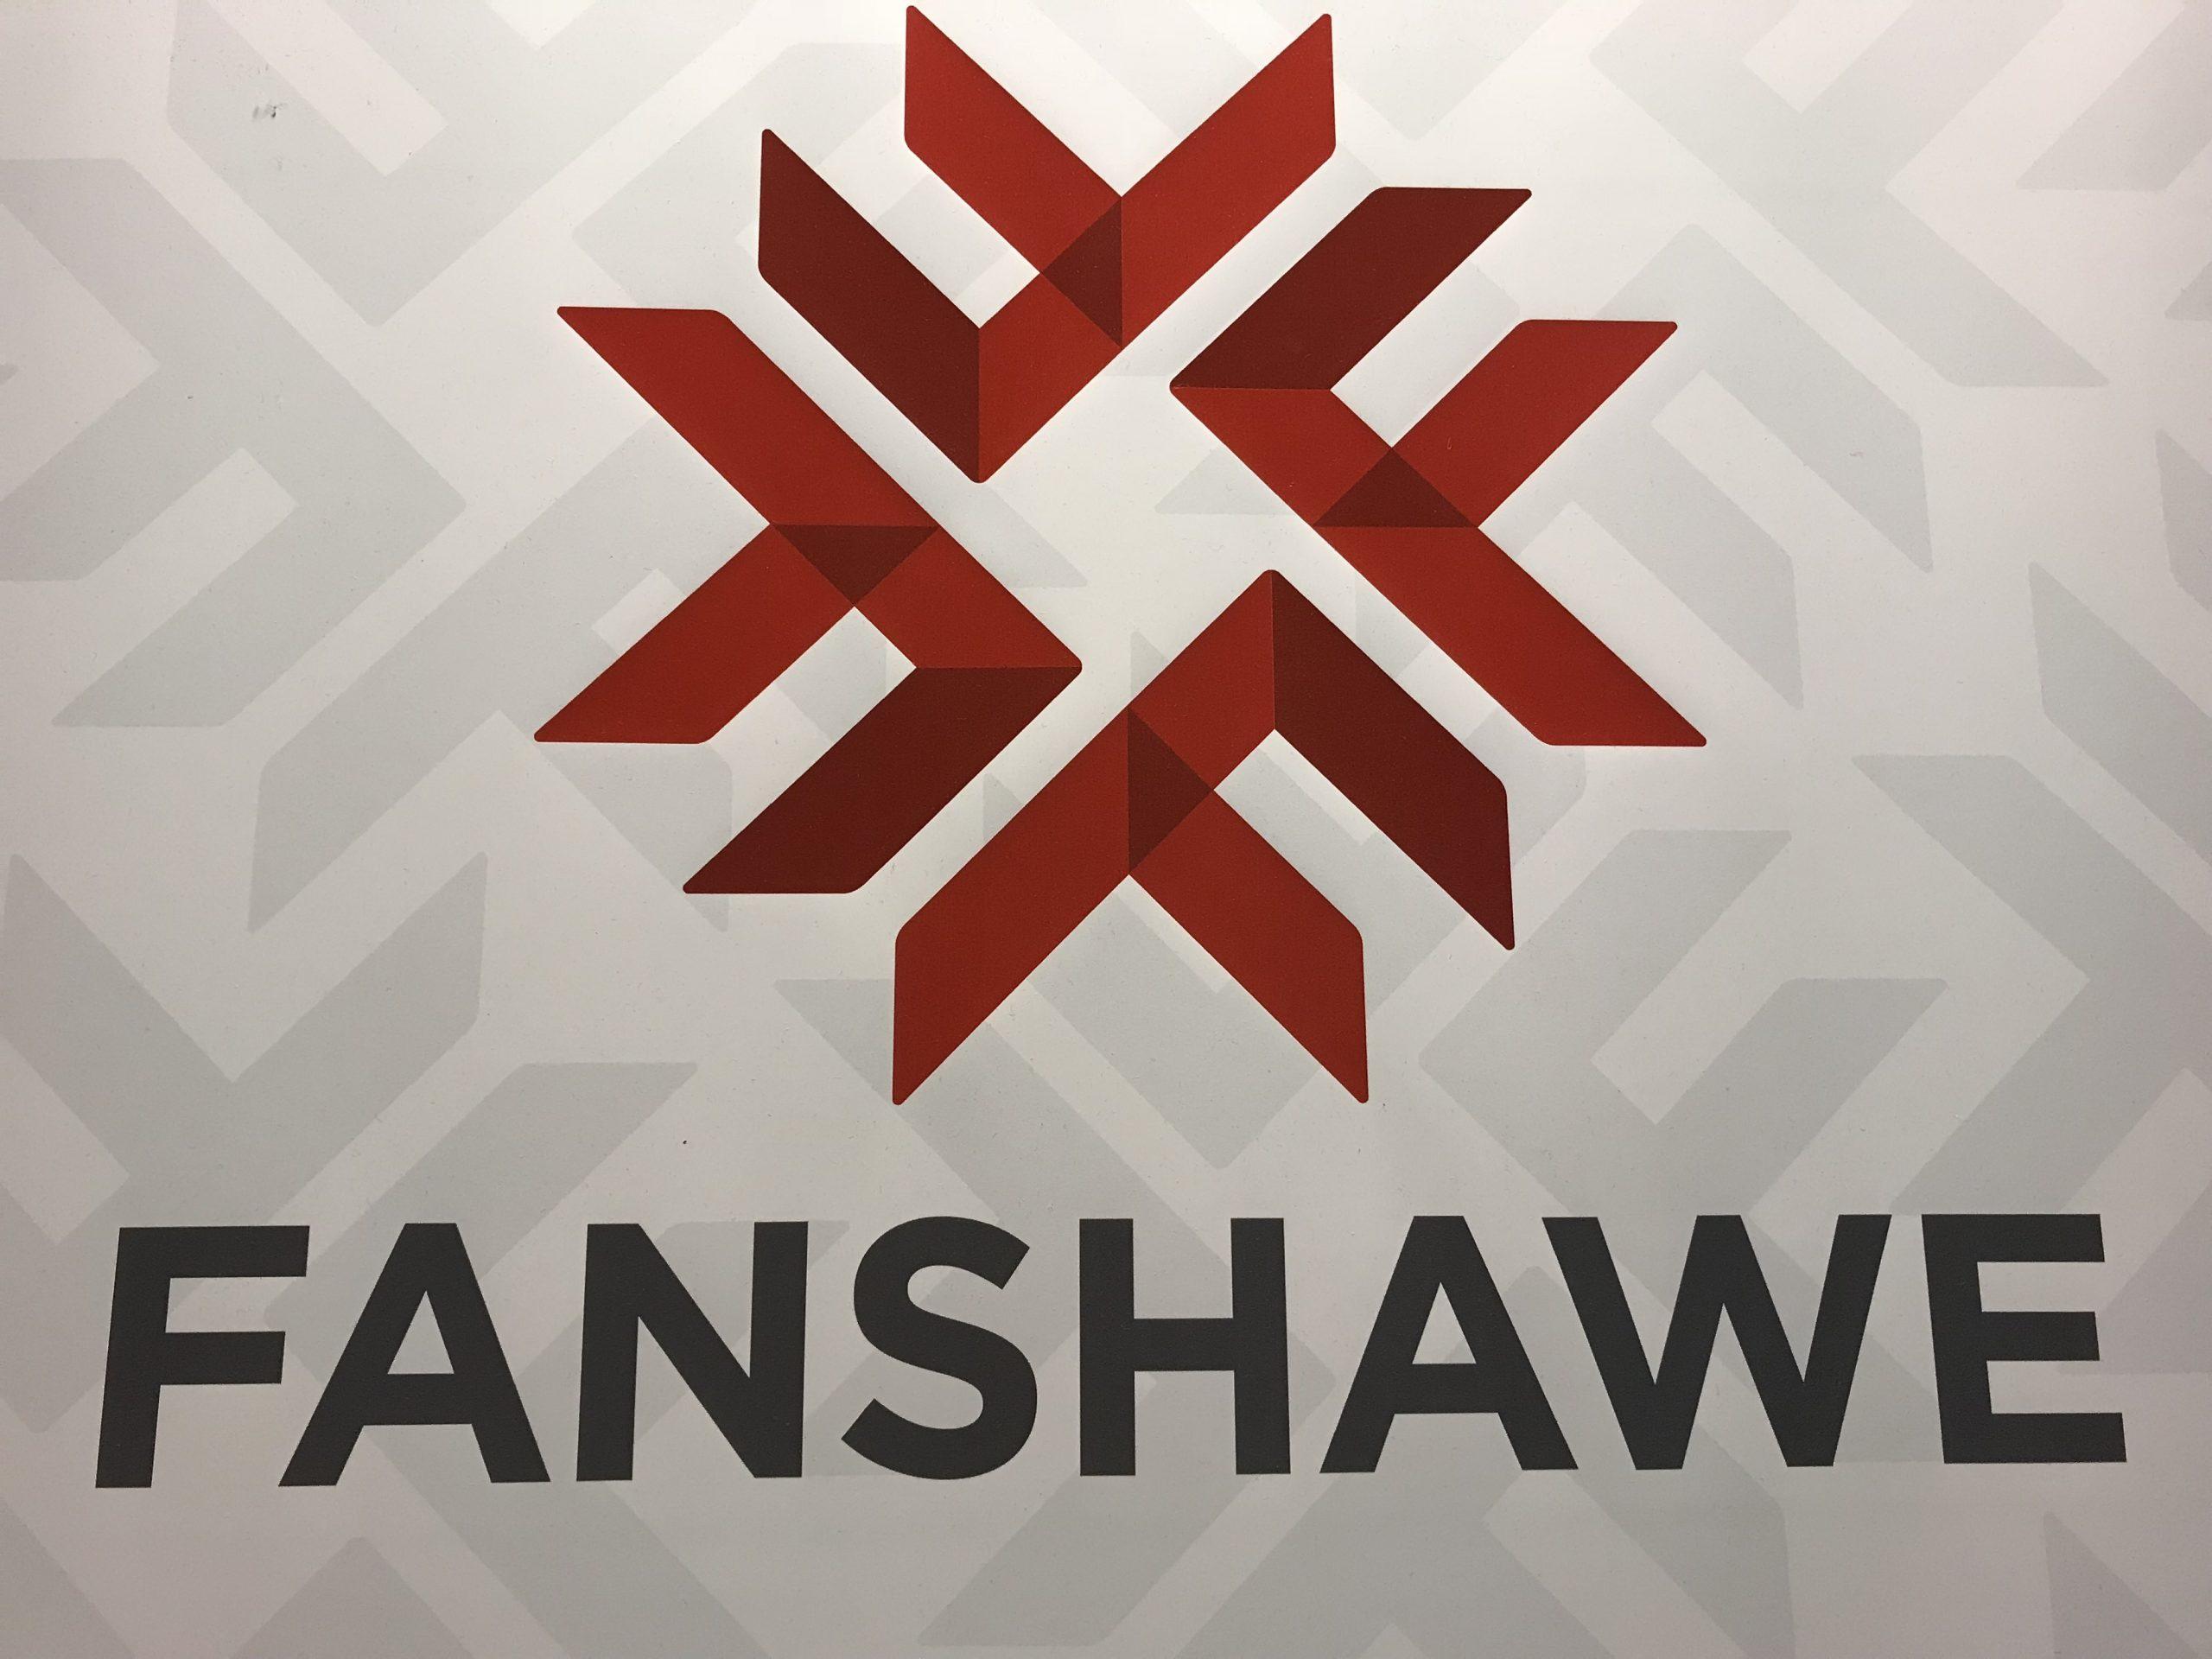 Fanshawe's untouched millions